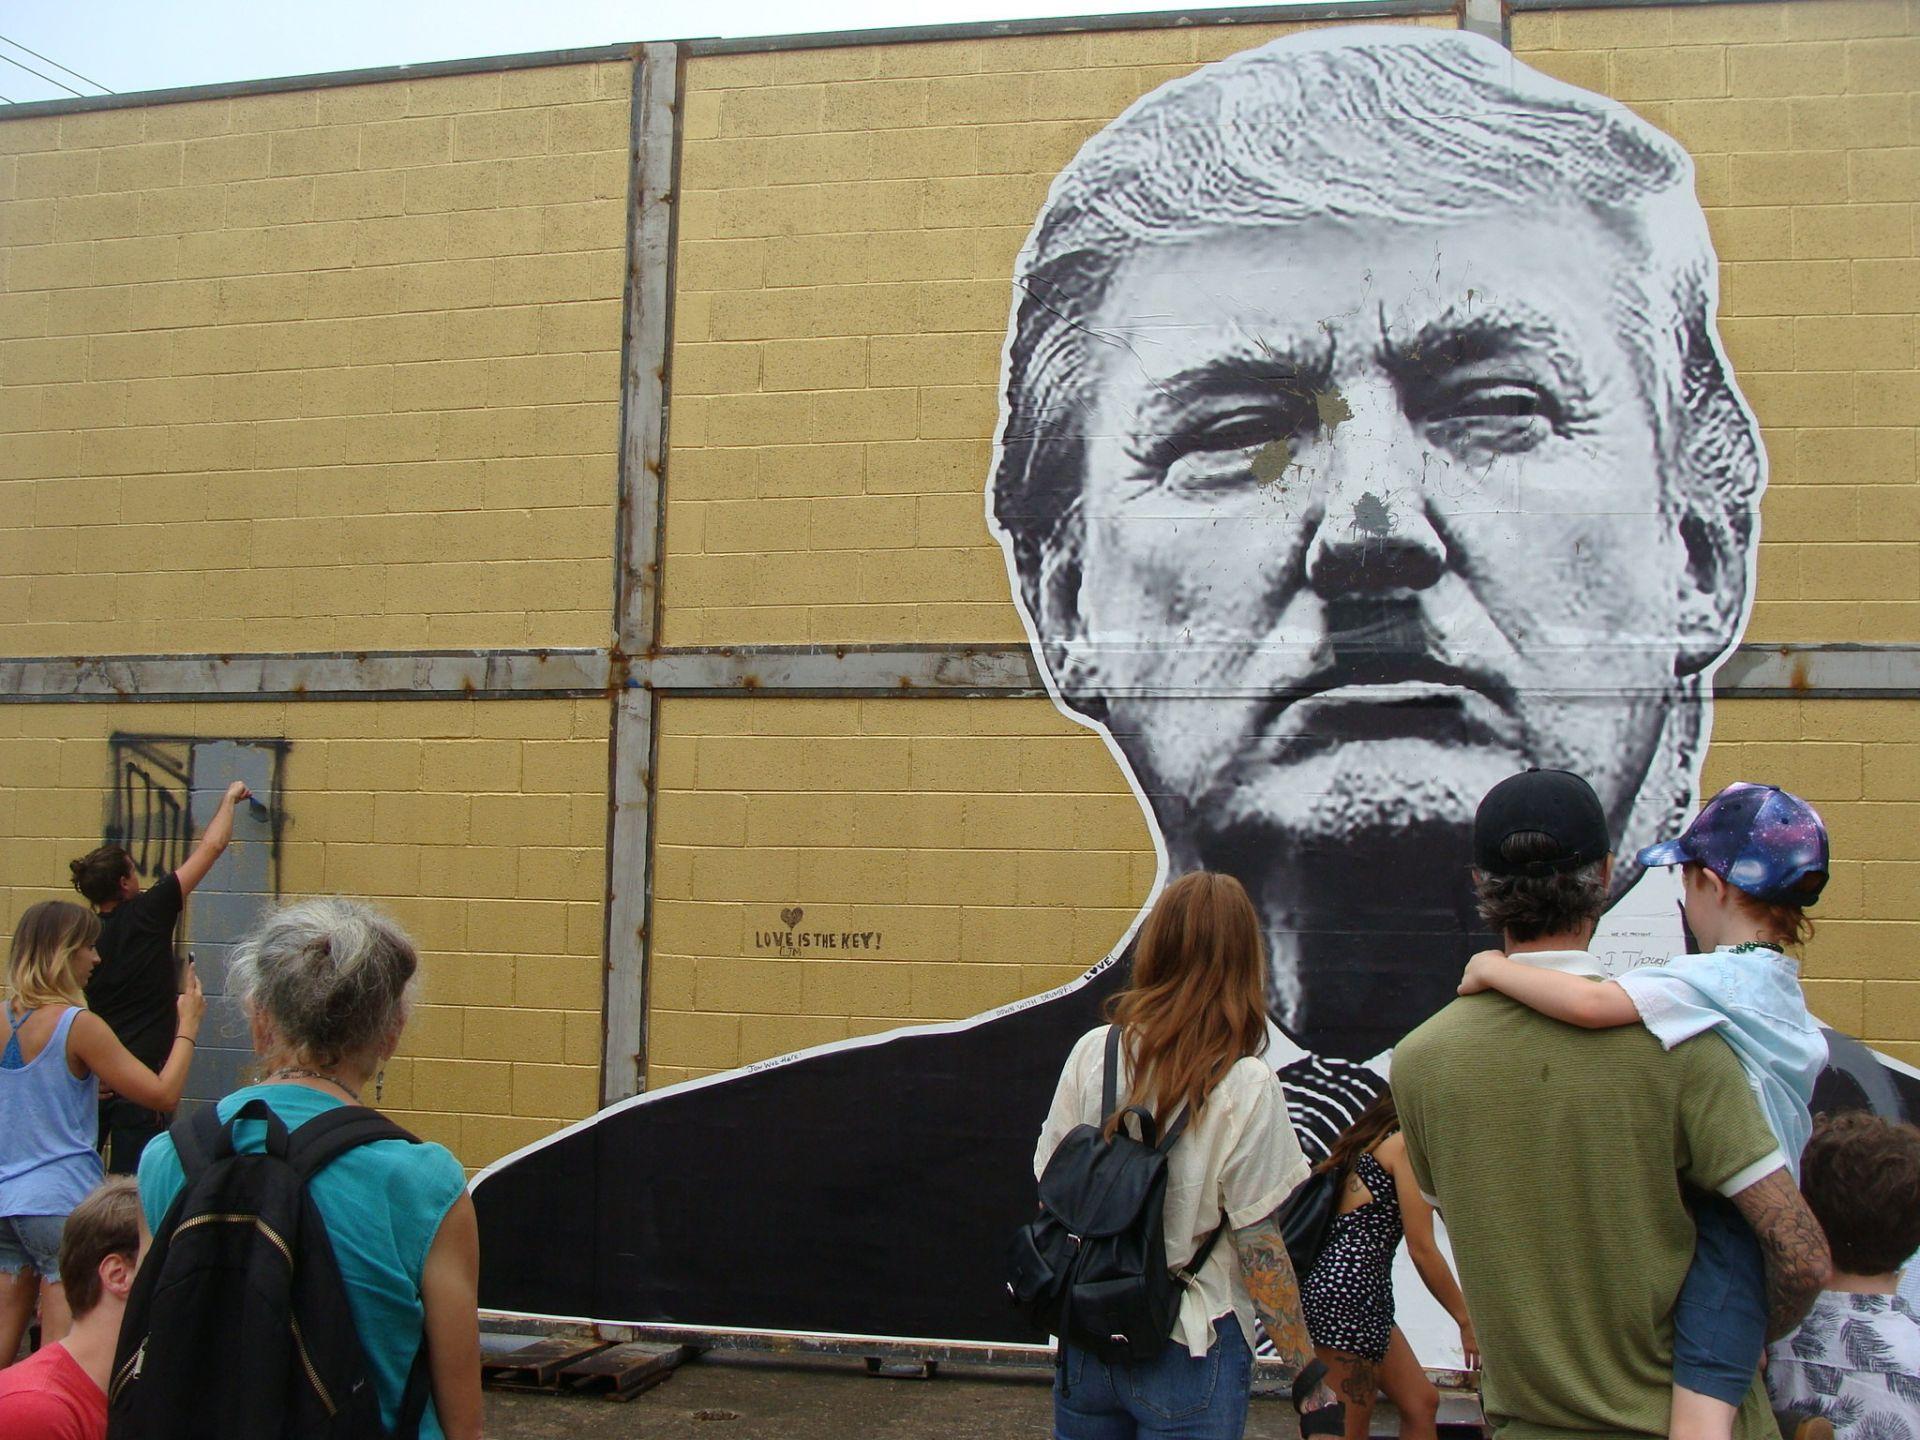 el muro fronterizo